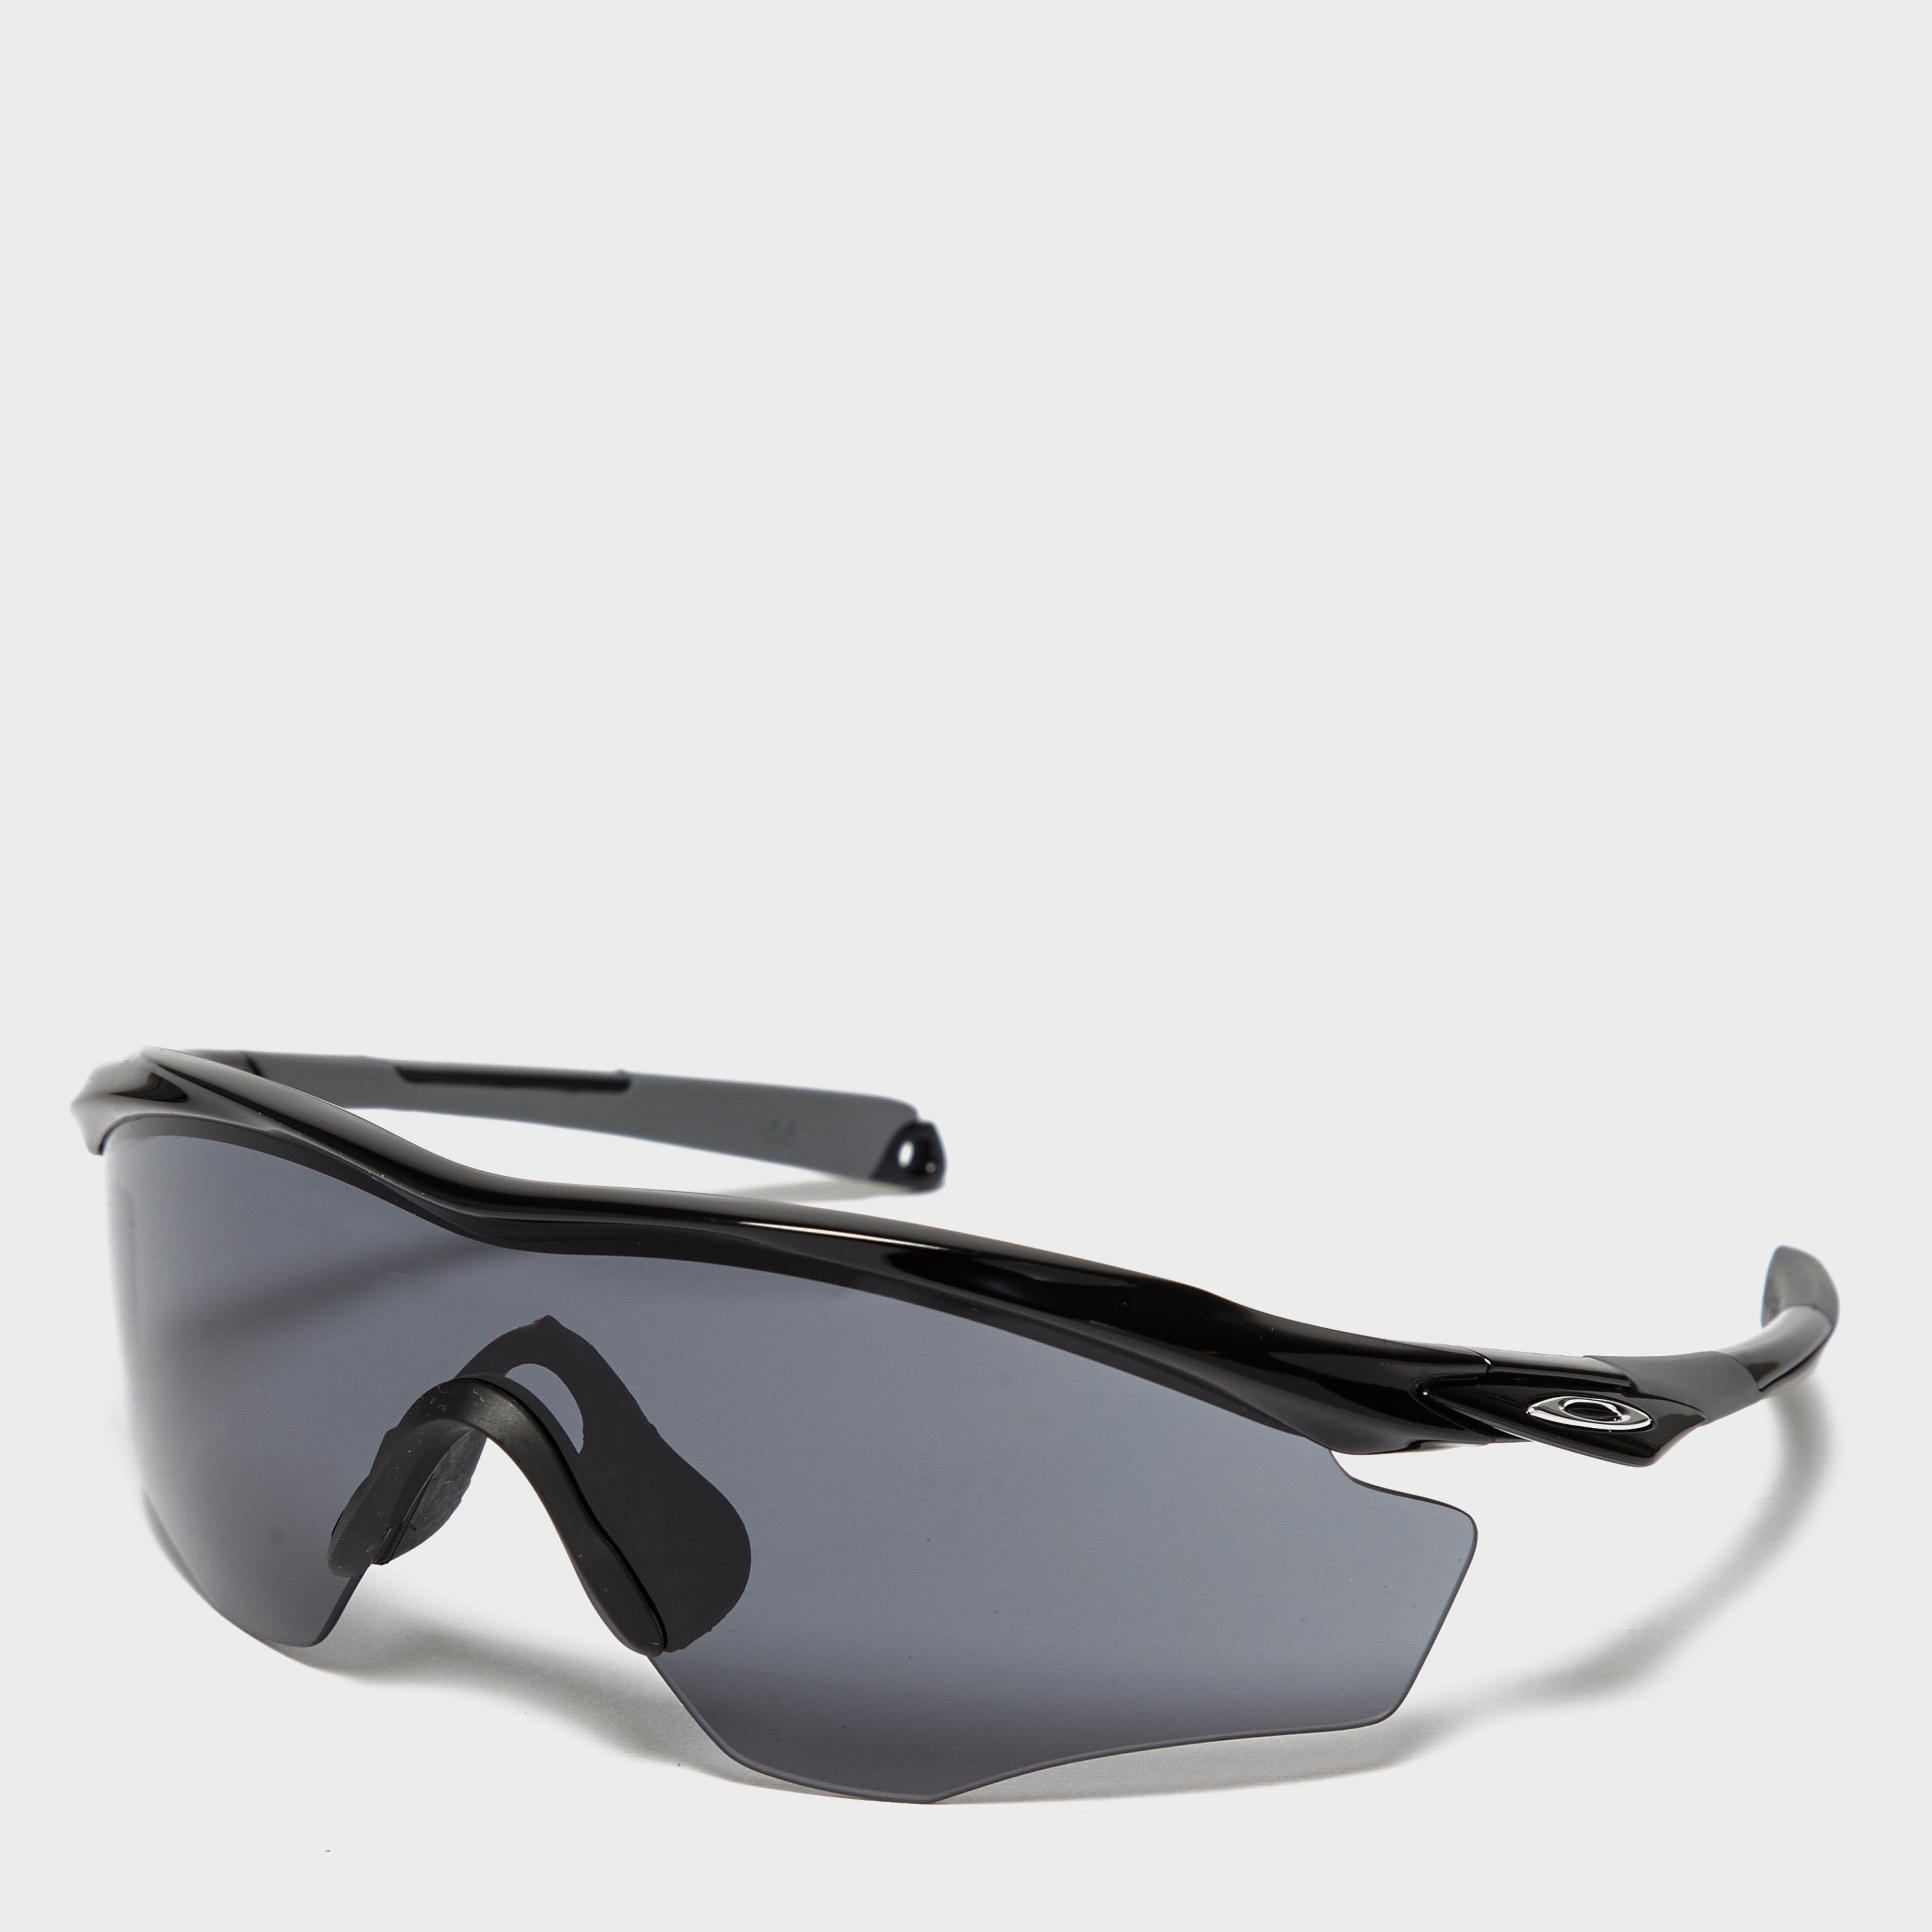 Oakley M2 Frame XL Sunglasses, Assorted